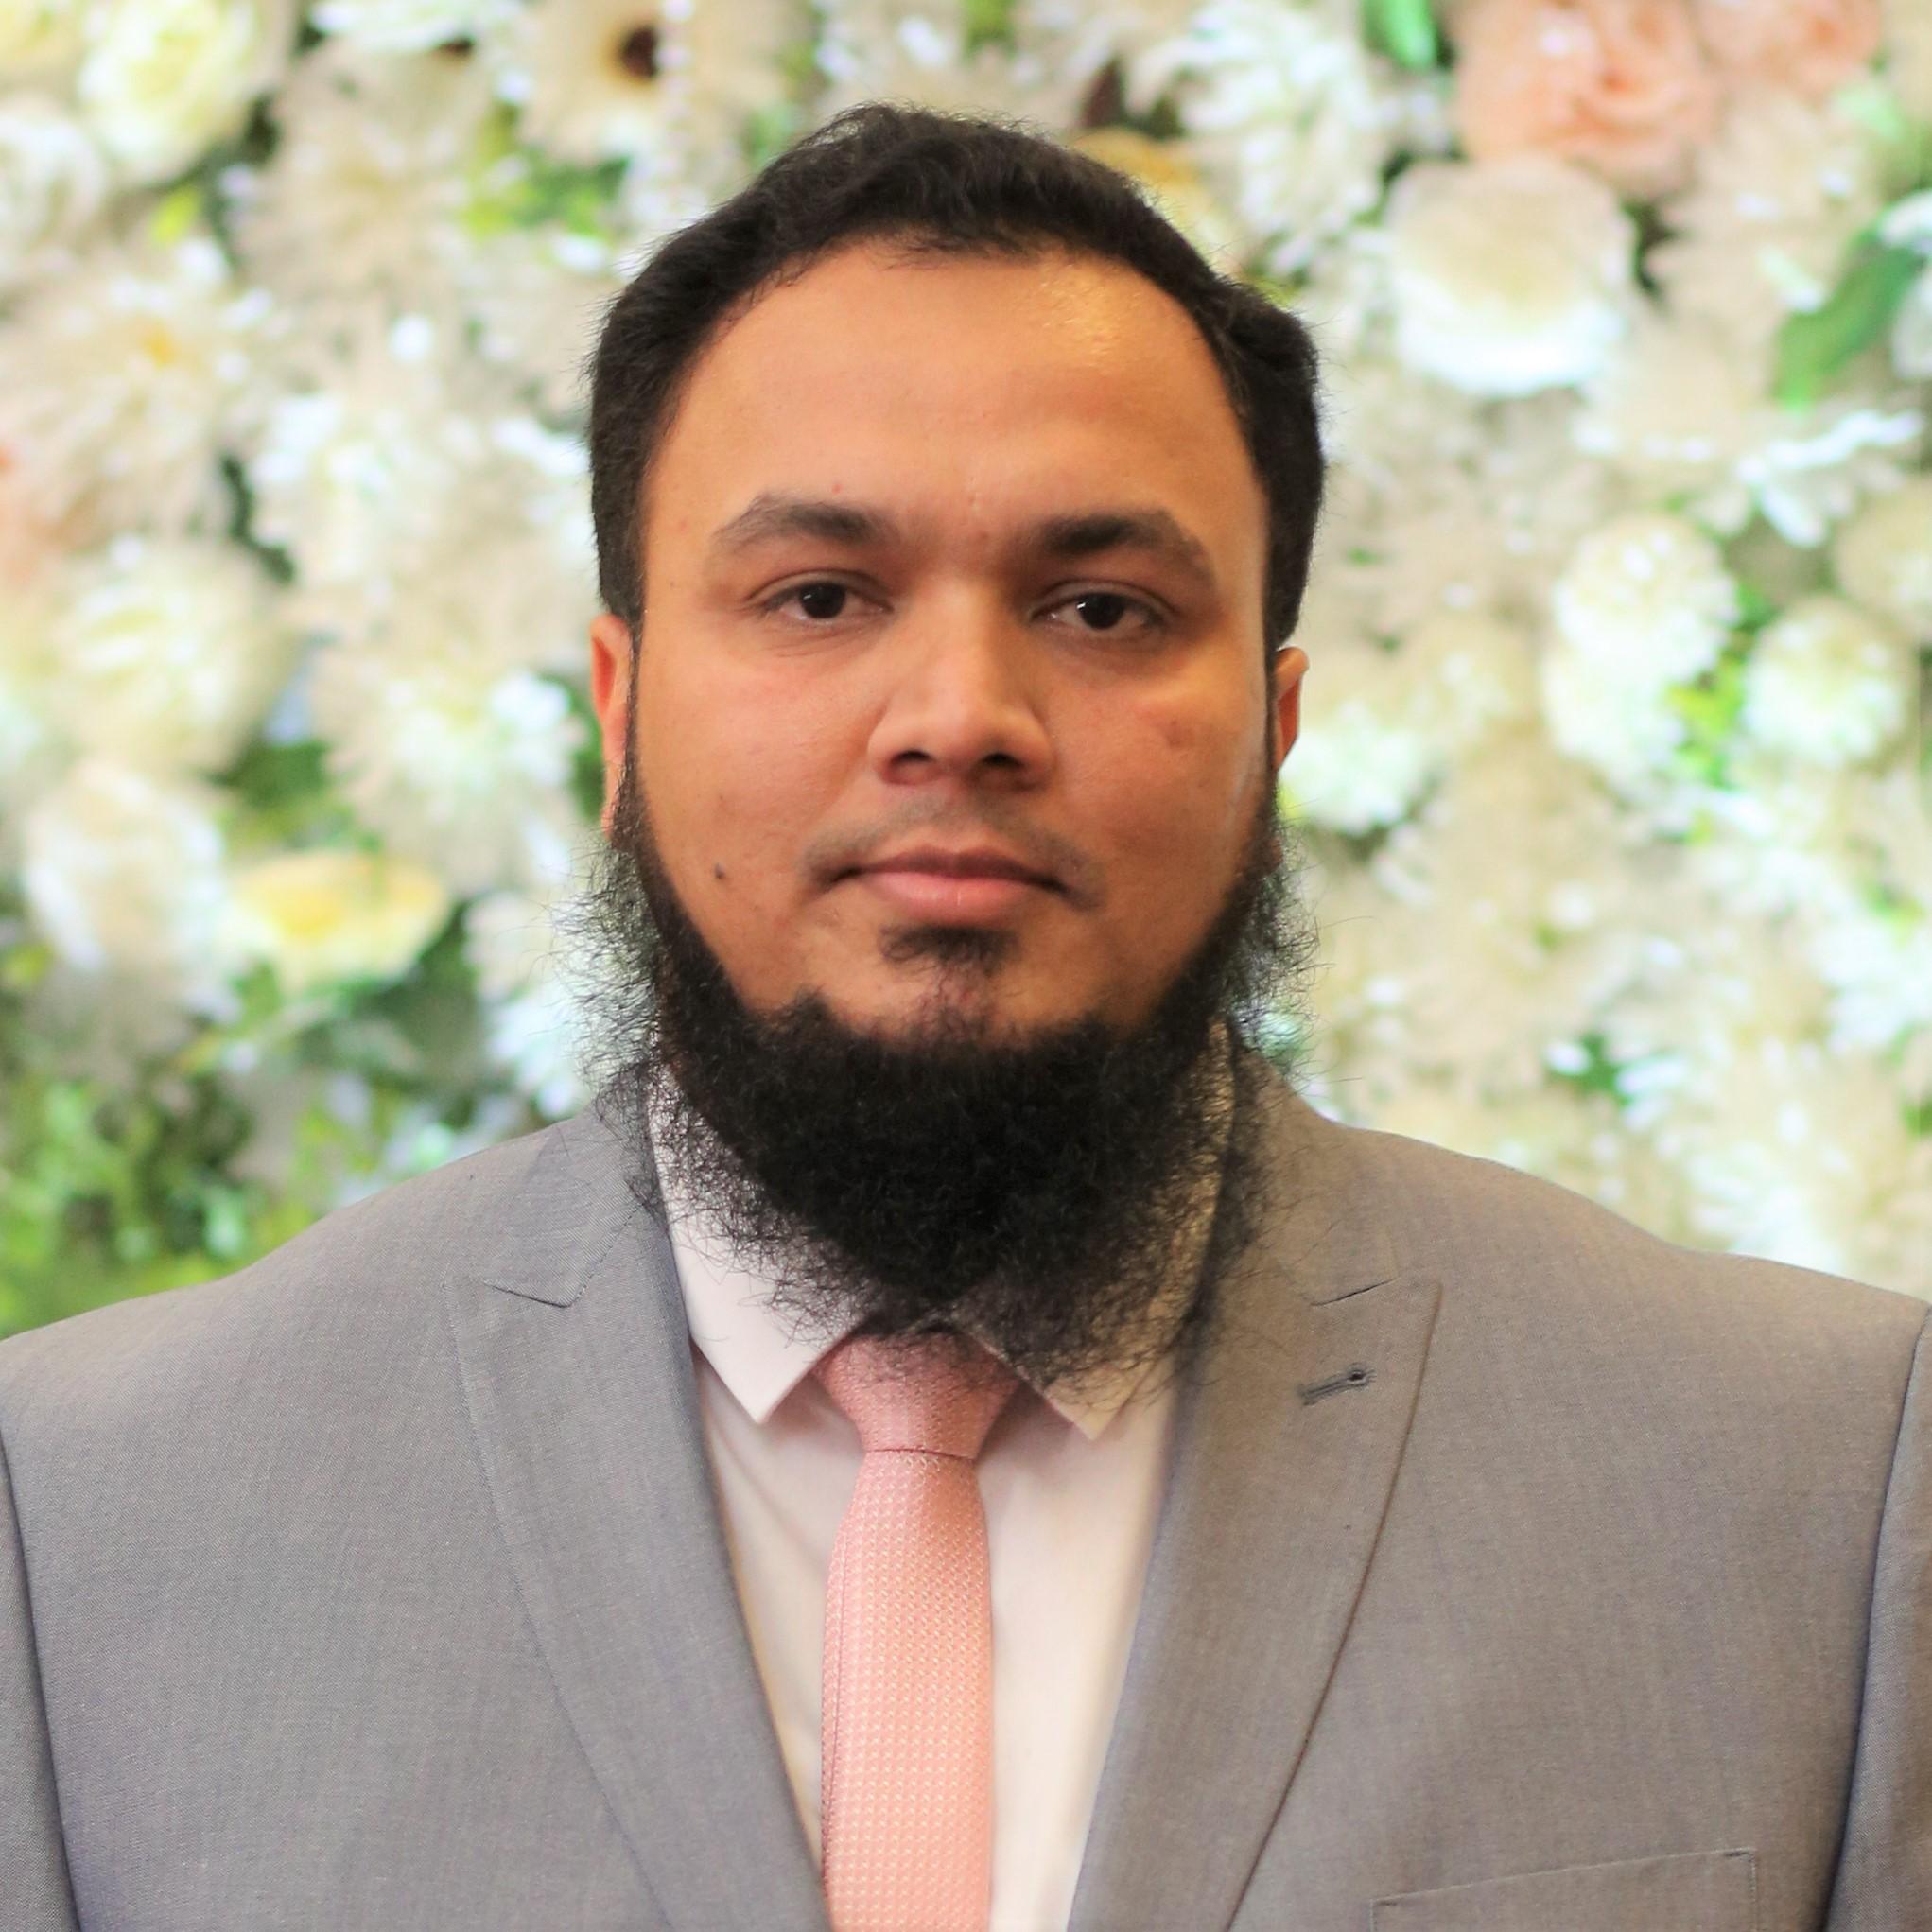 RevGlue CEO Adeel Farooq